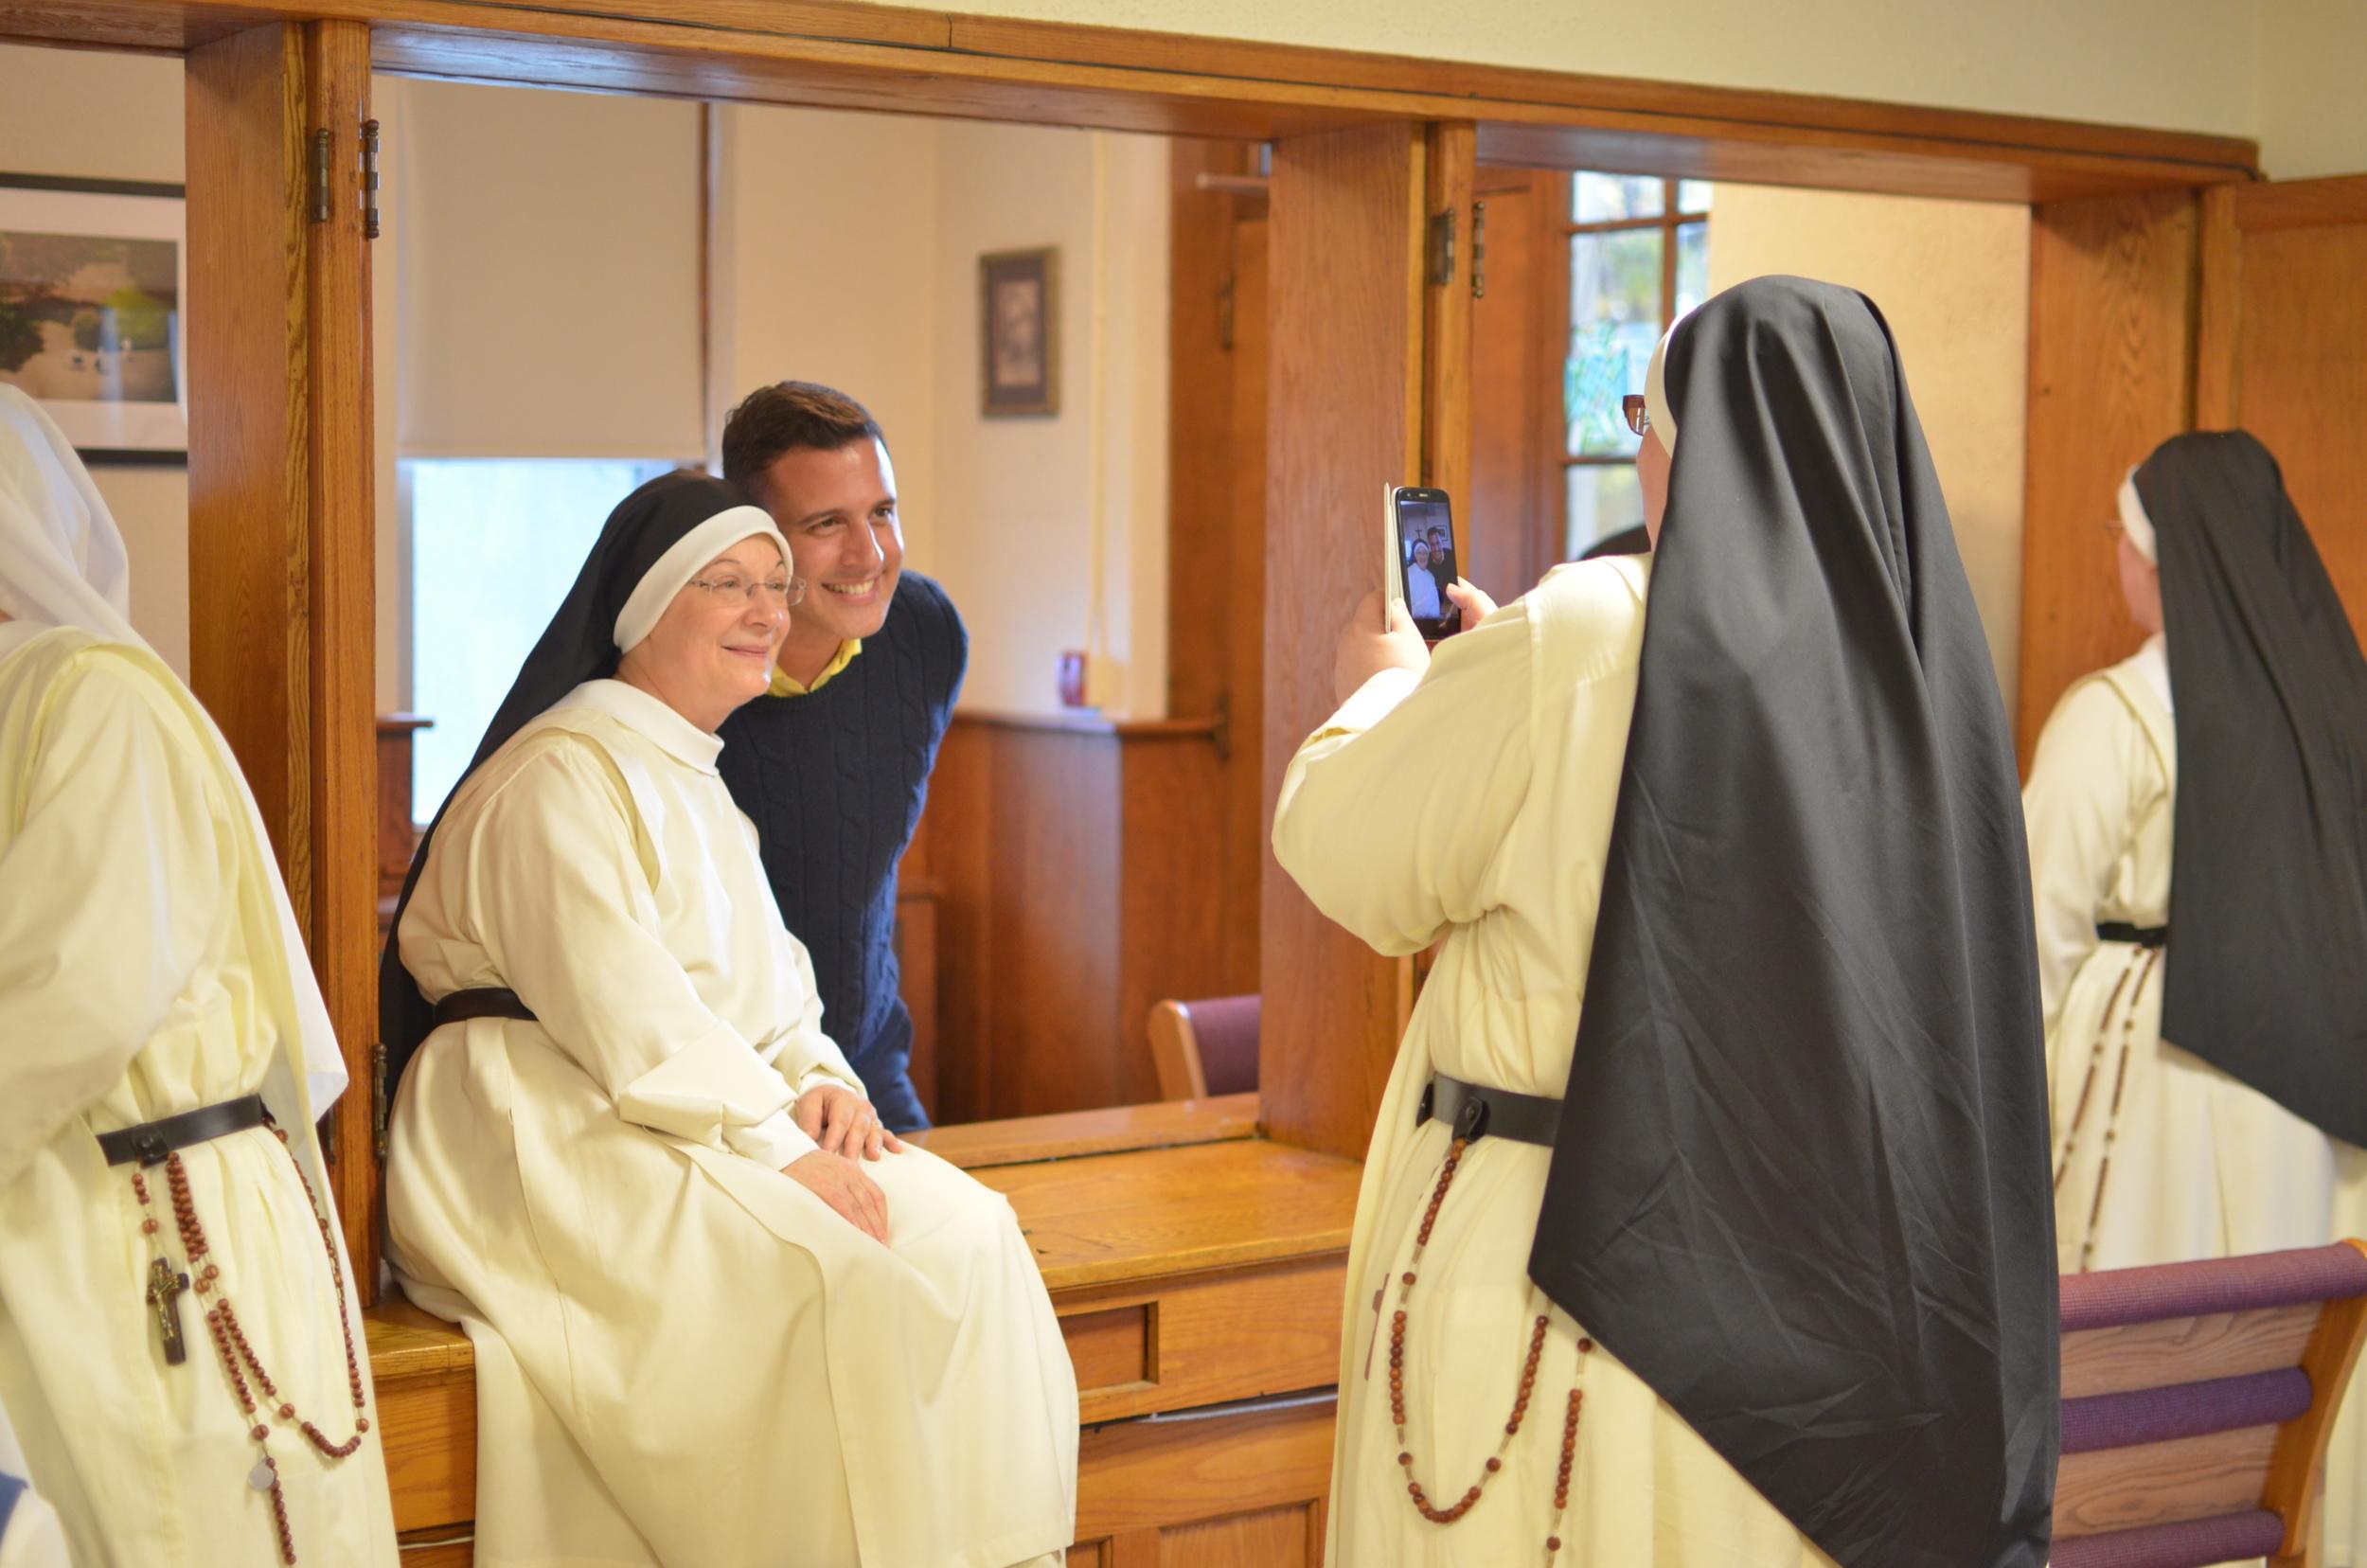 Sr. Denise Marie was overjoyed to finally meet her seminarian!